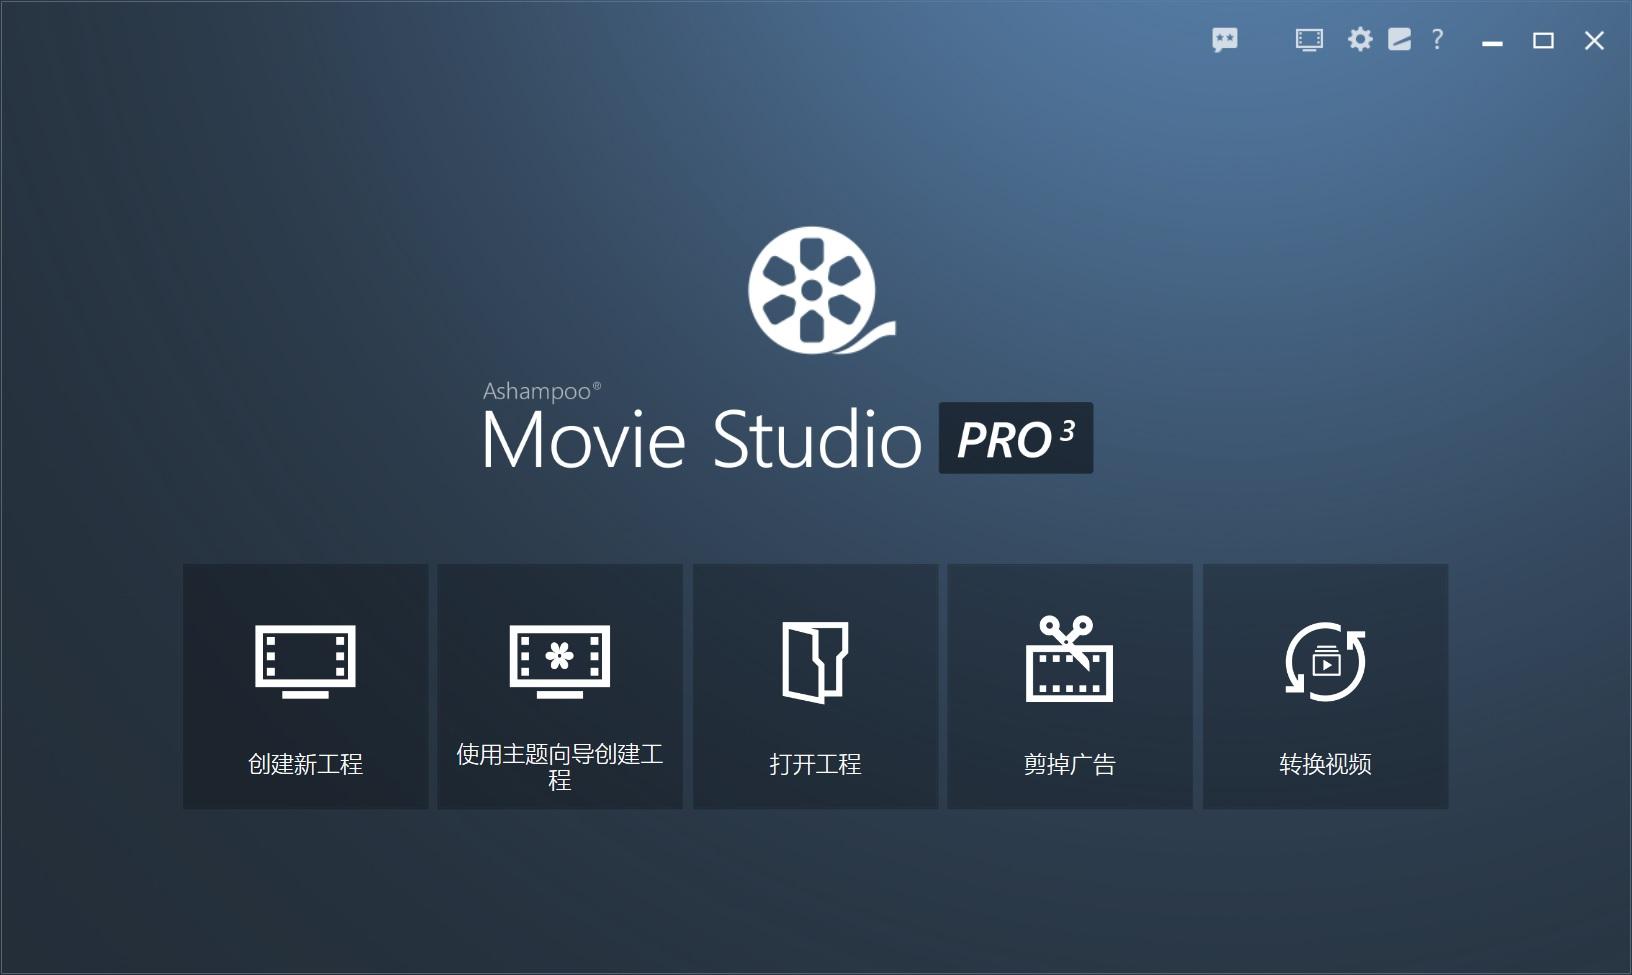 Ashampoo Movie Studio 破解版 v3.0.0 中文破解版(附注册机)—视频编辑软件